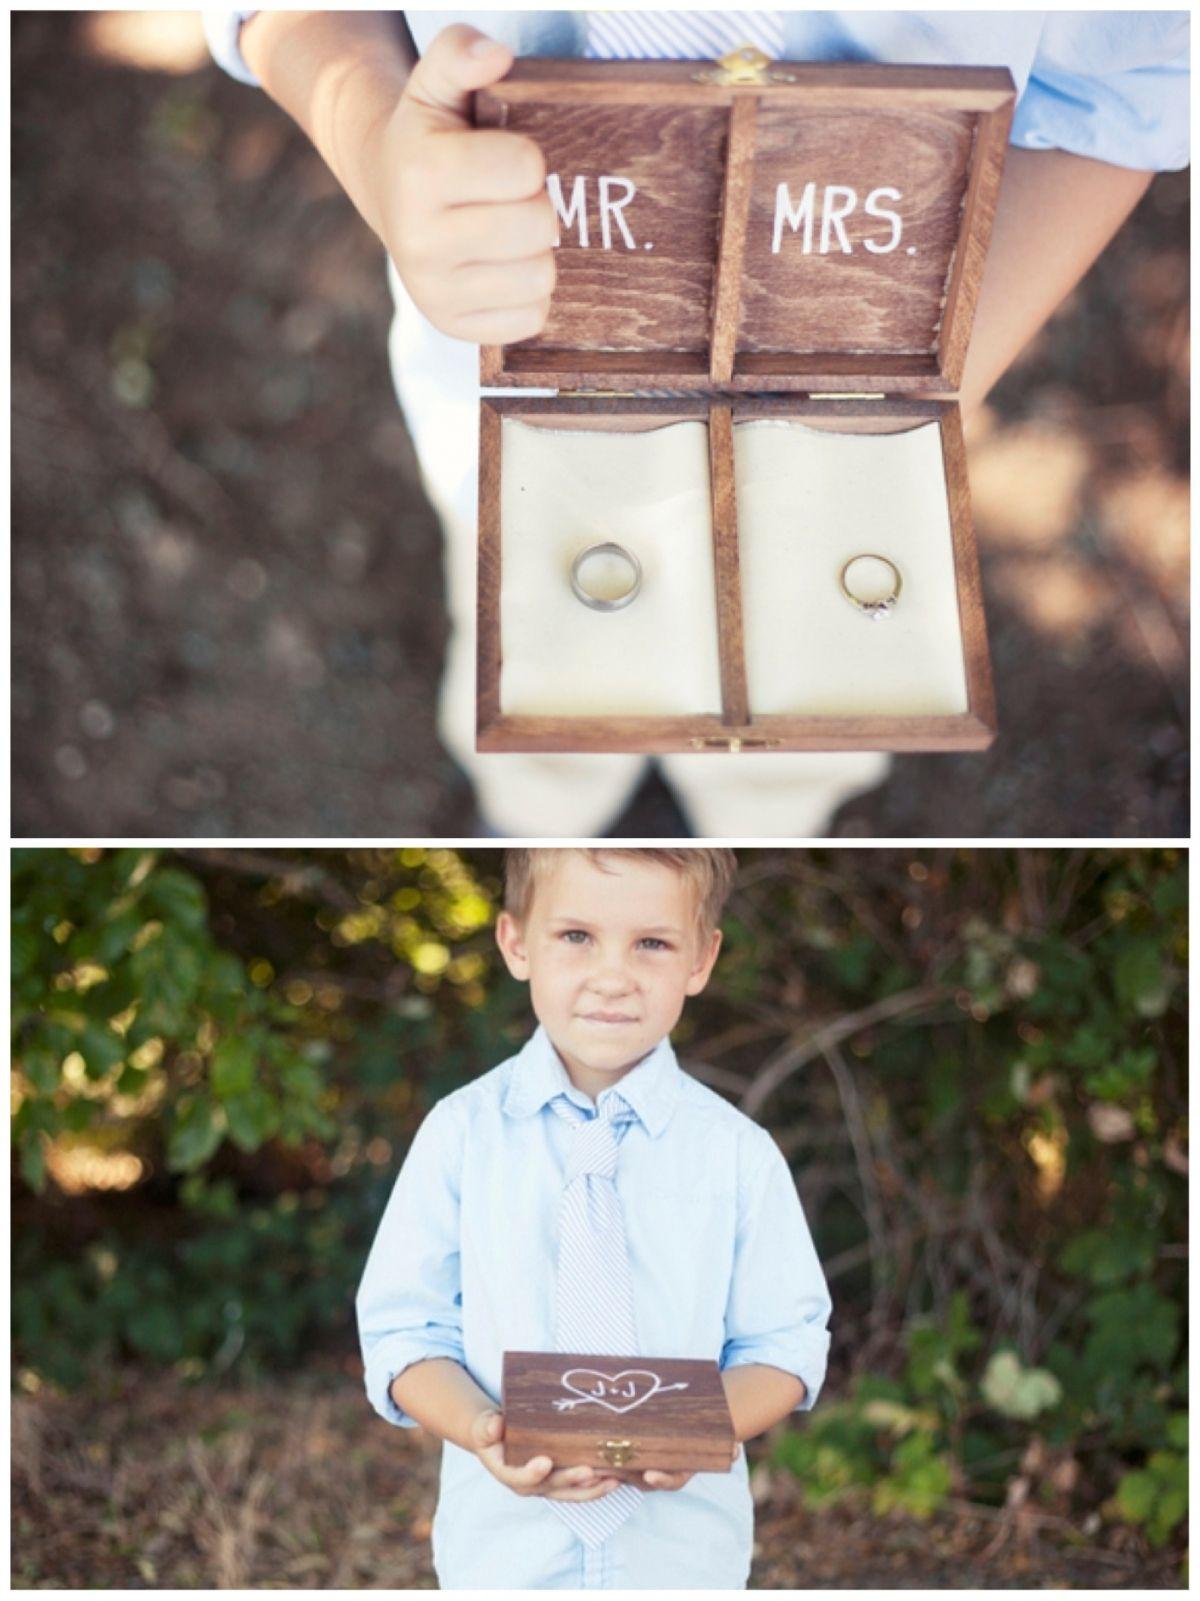 DIY Personalized Wooden Ring Bearer Box Super adorable idea I m